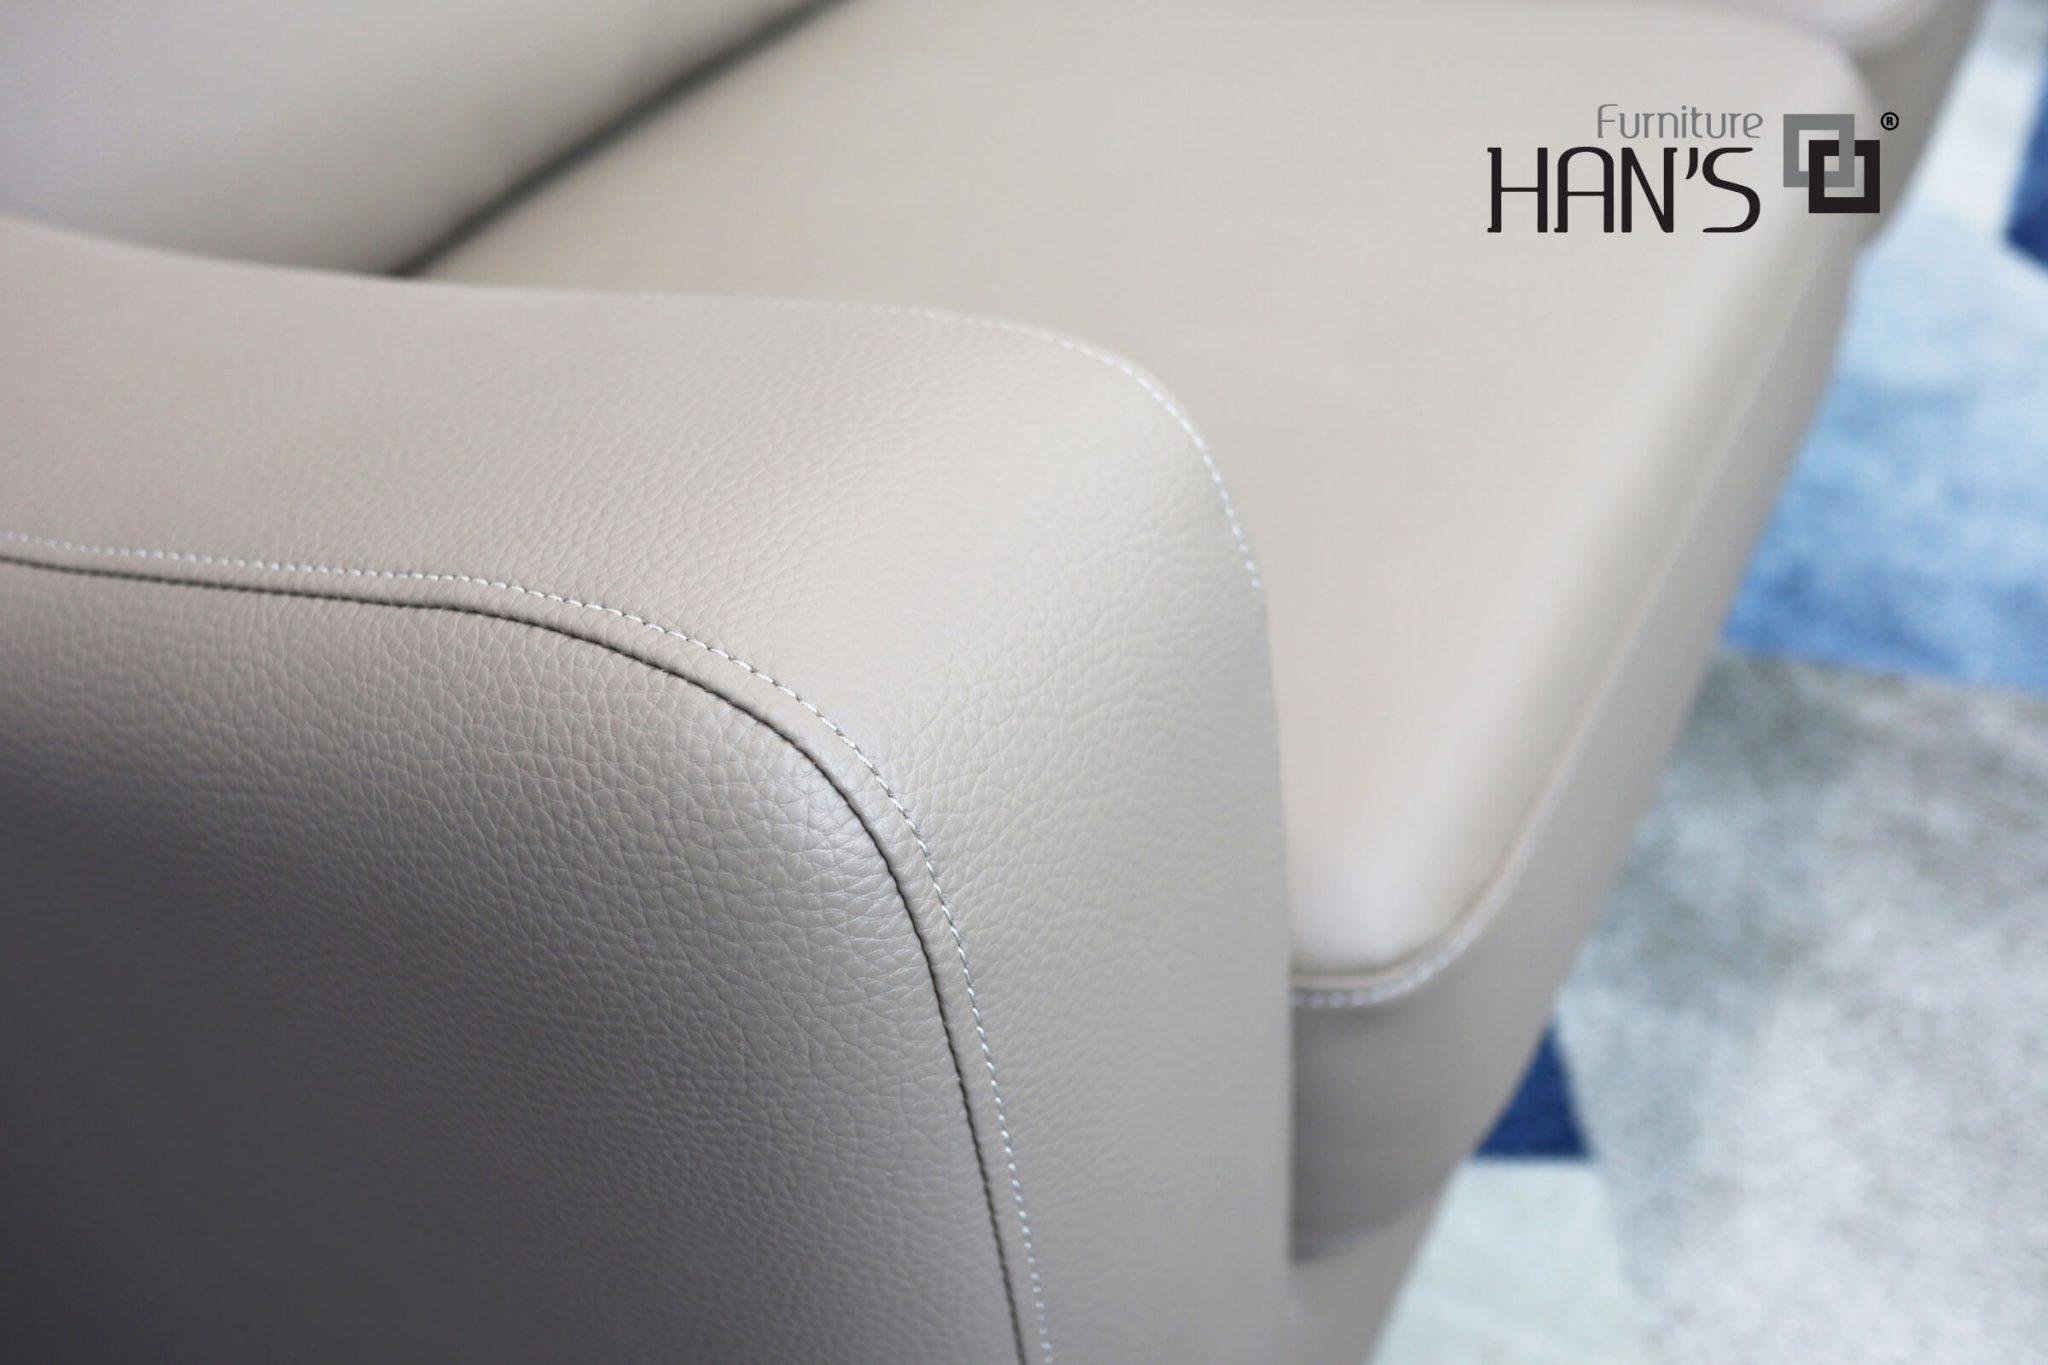 sofa da selina (5)